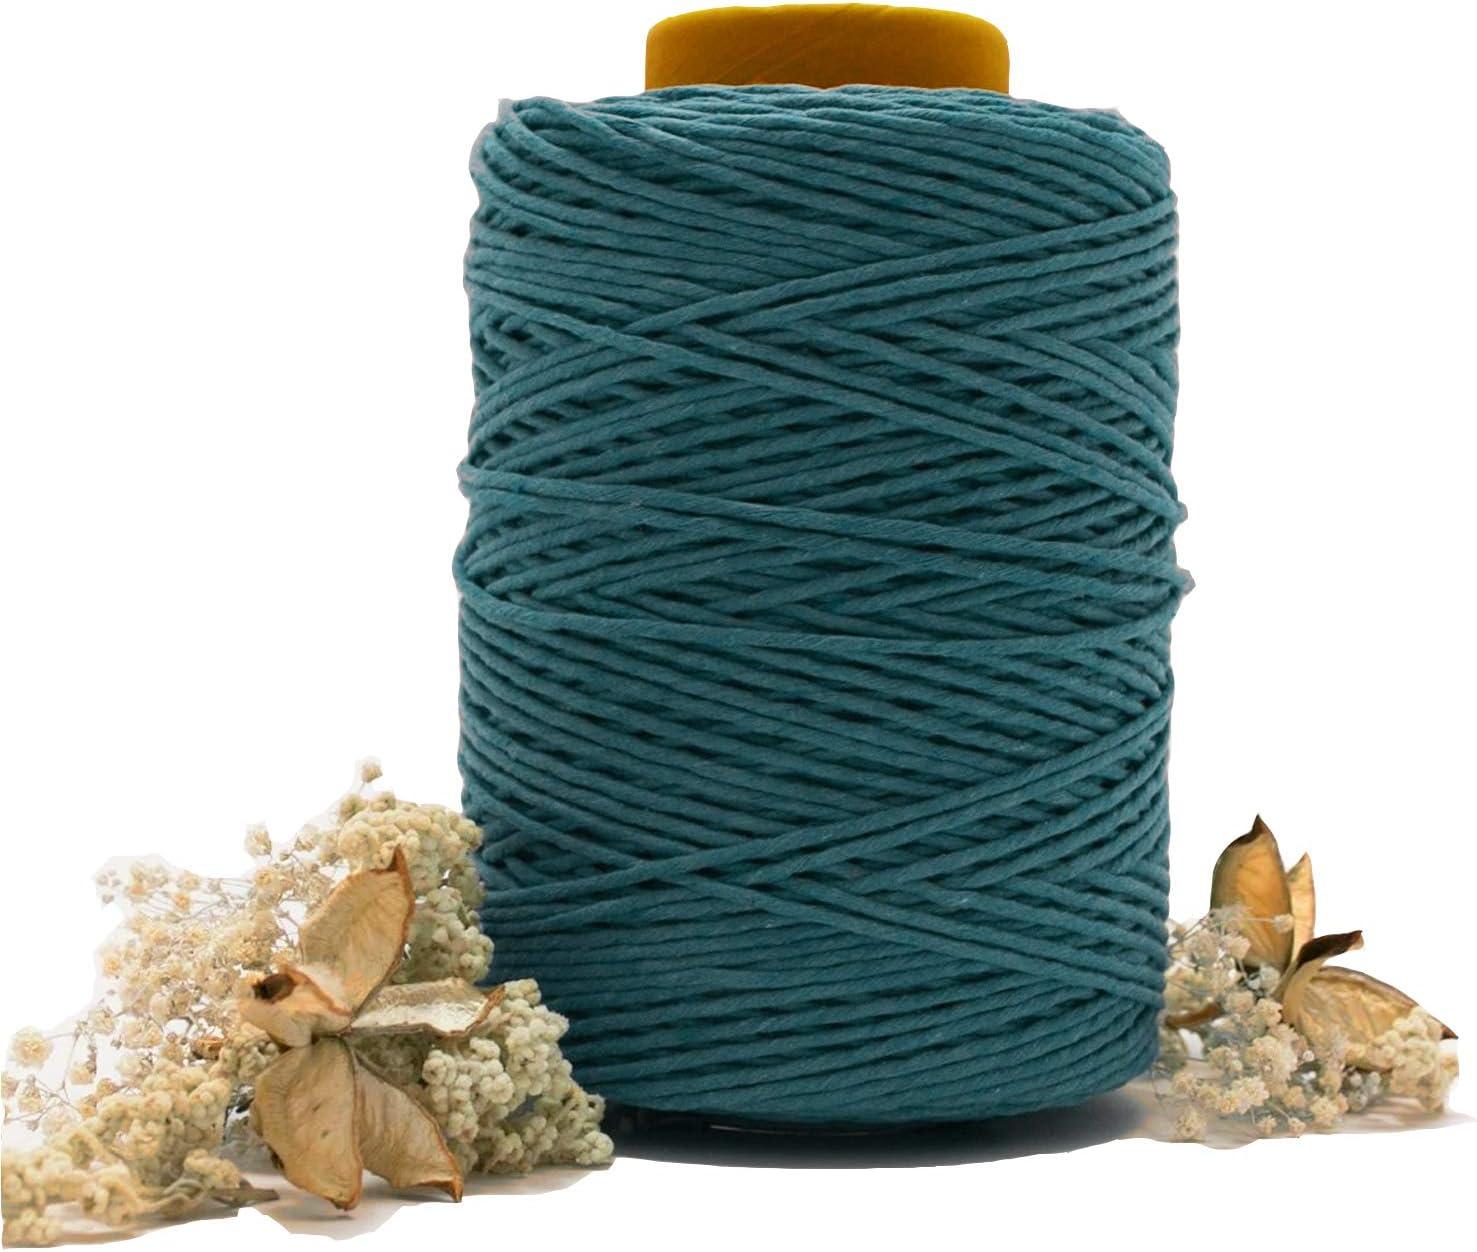 Macrame Cord Blackish Green 3mm x 109Yards(100m), ArtStudy 100% Natural Macrame Cotton Rope 4 Strand Craft Cord for Handmade Wall Hanging, Plant Hangers, DIY Craft Knitting, Boho Decors(3mm x 109yd)